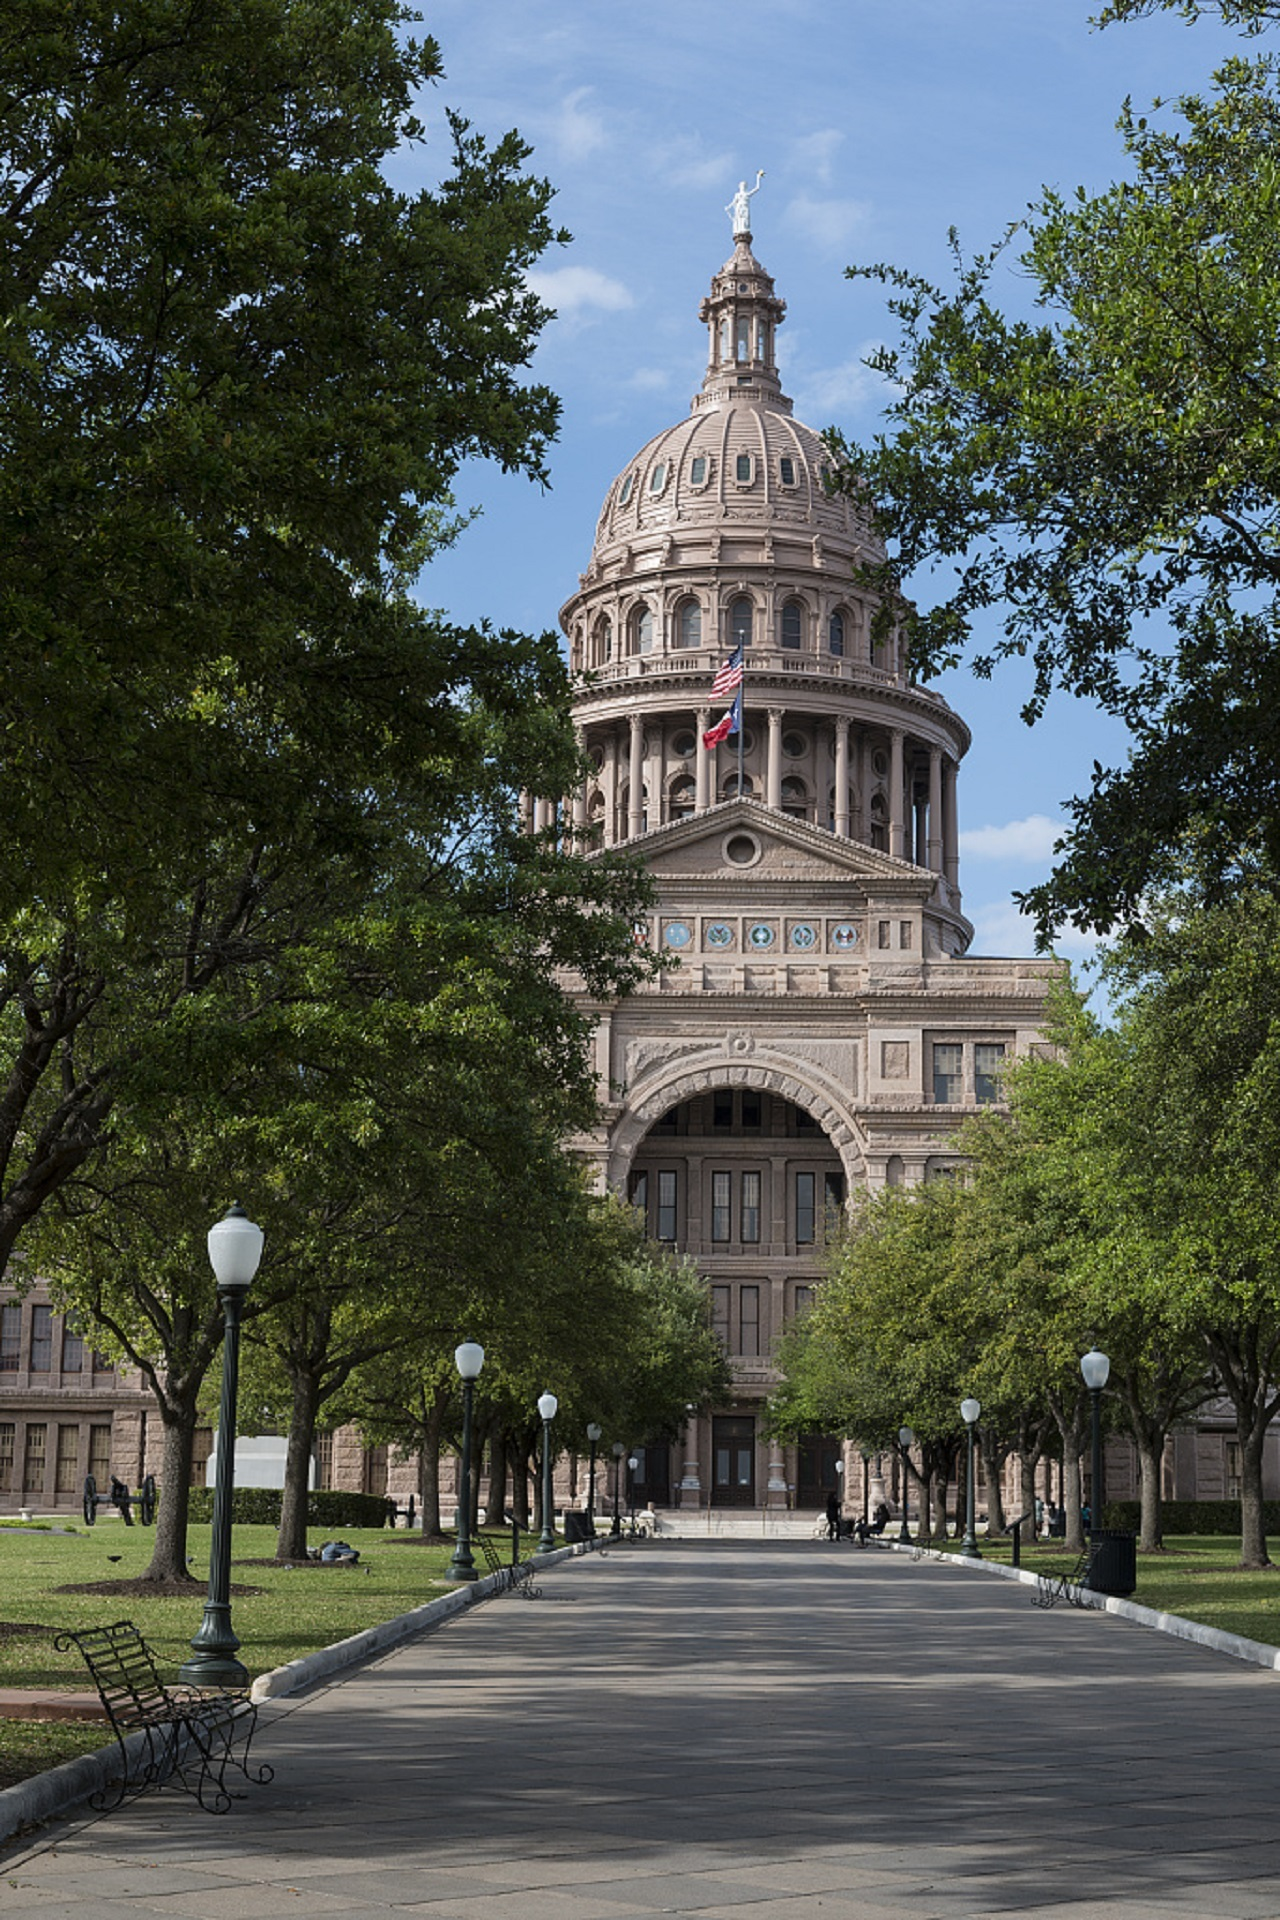 Capitol building photo